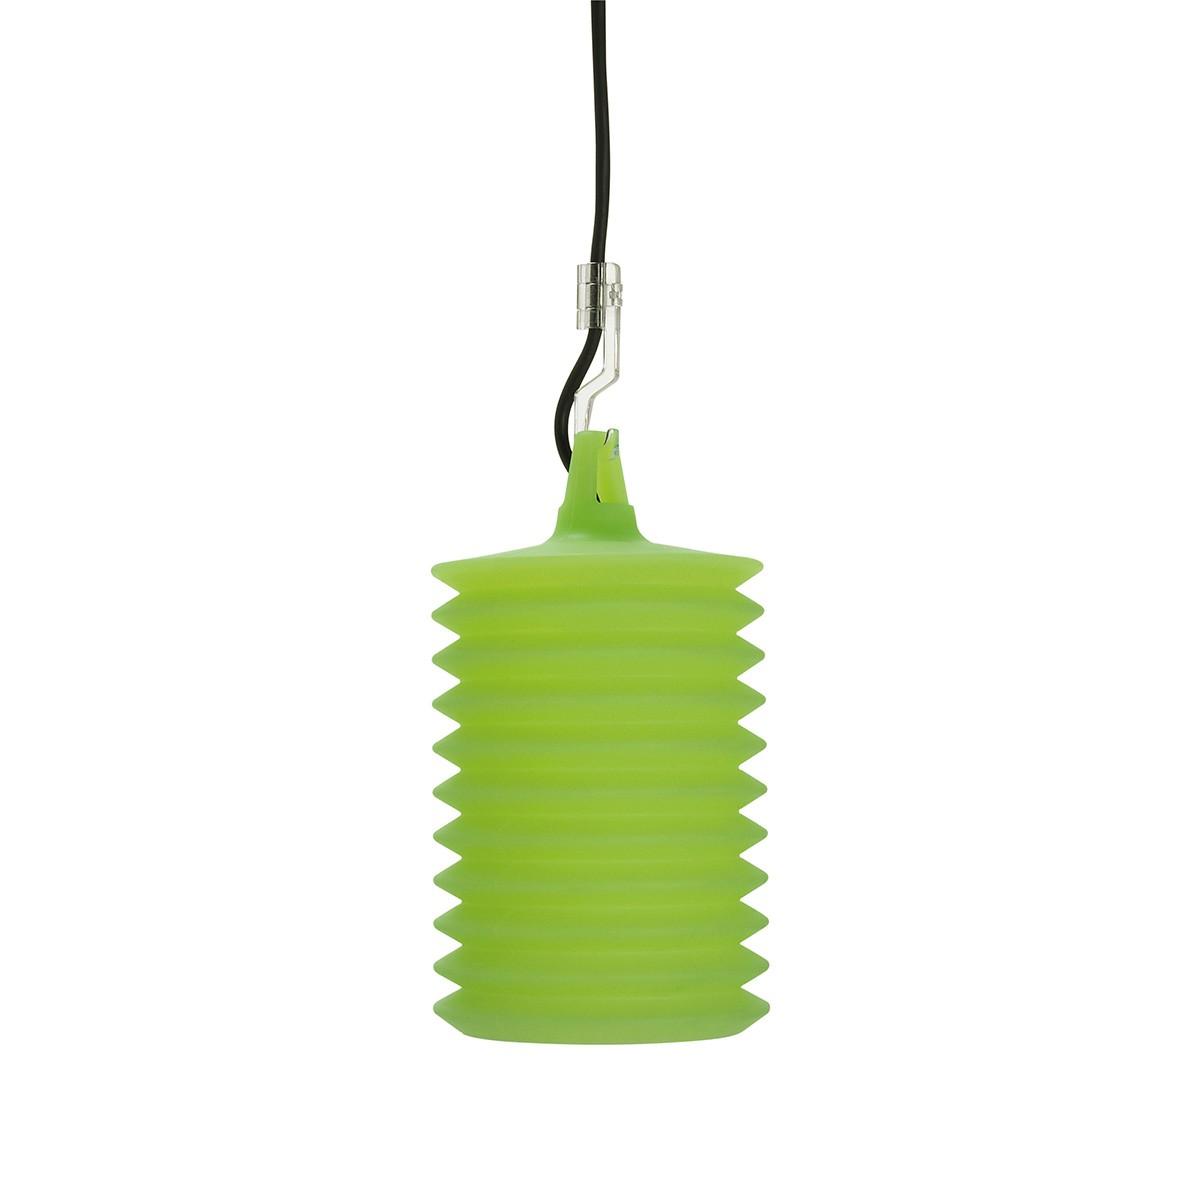 Rotaliana Lampion H2 Pendelleuchte, grün, ohne Stecker